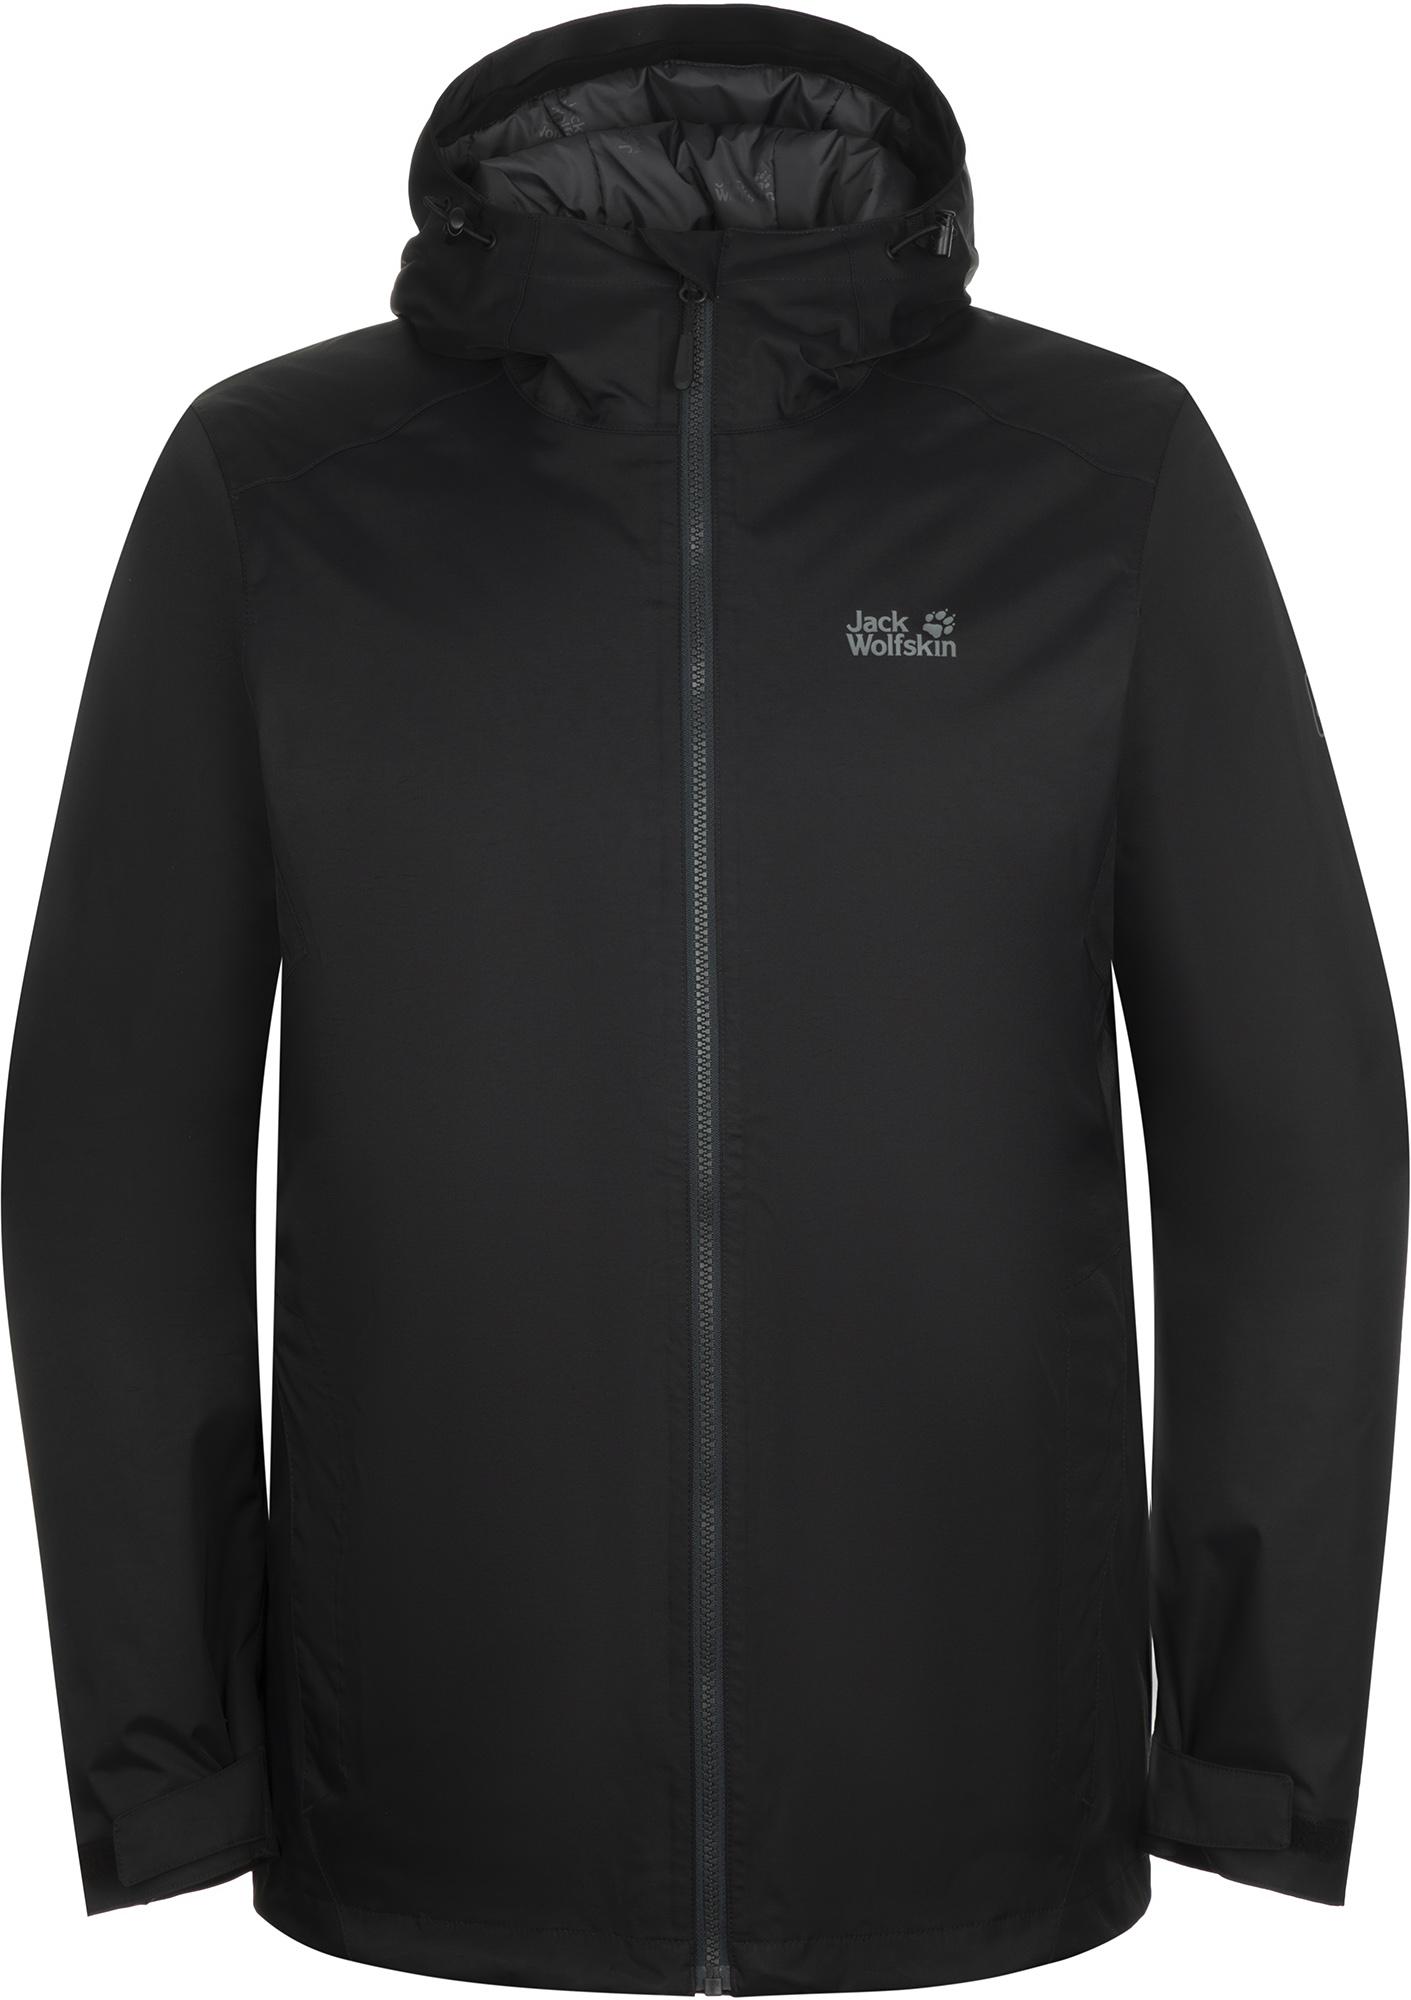 JACK WOLFSKIN Куртка утепленная мужская Jack Wolfskin Frosty Morning, размер 58